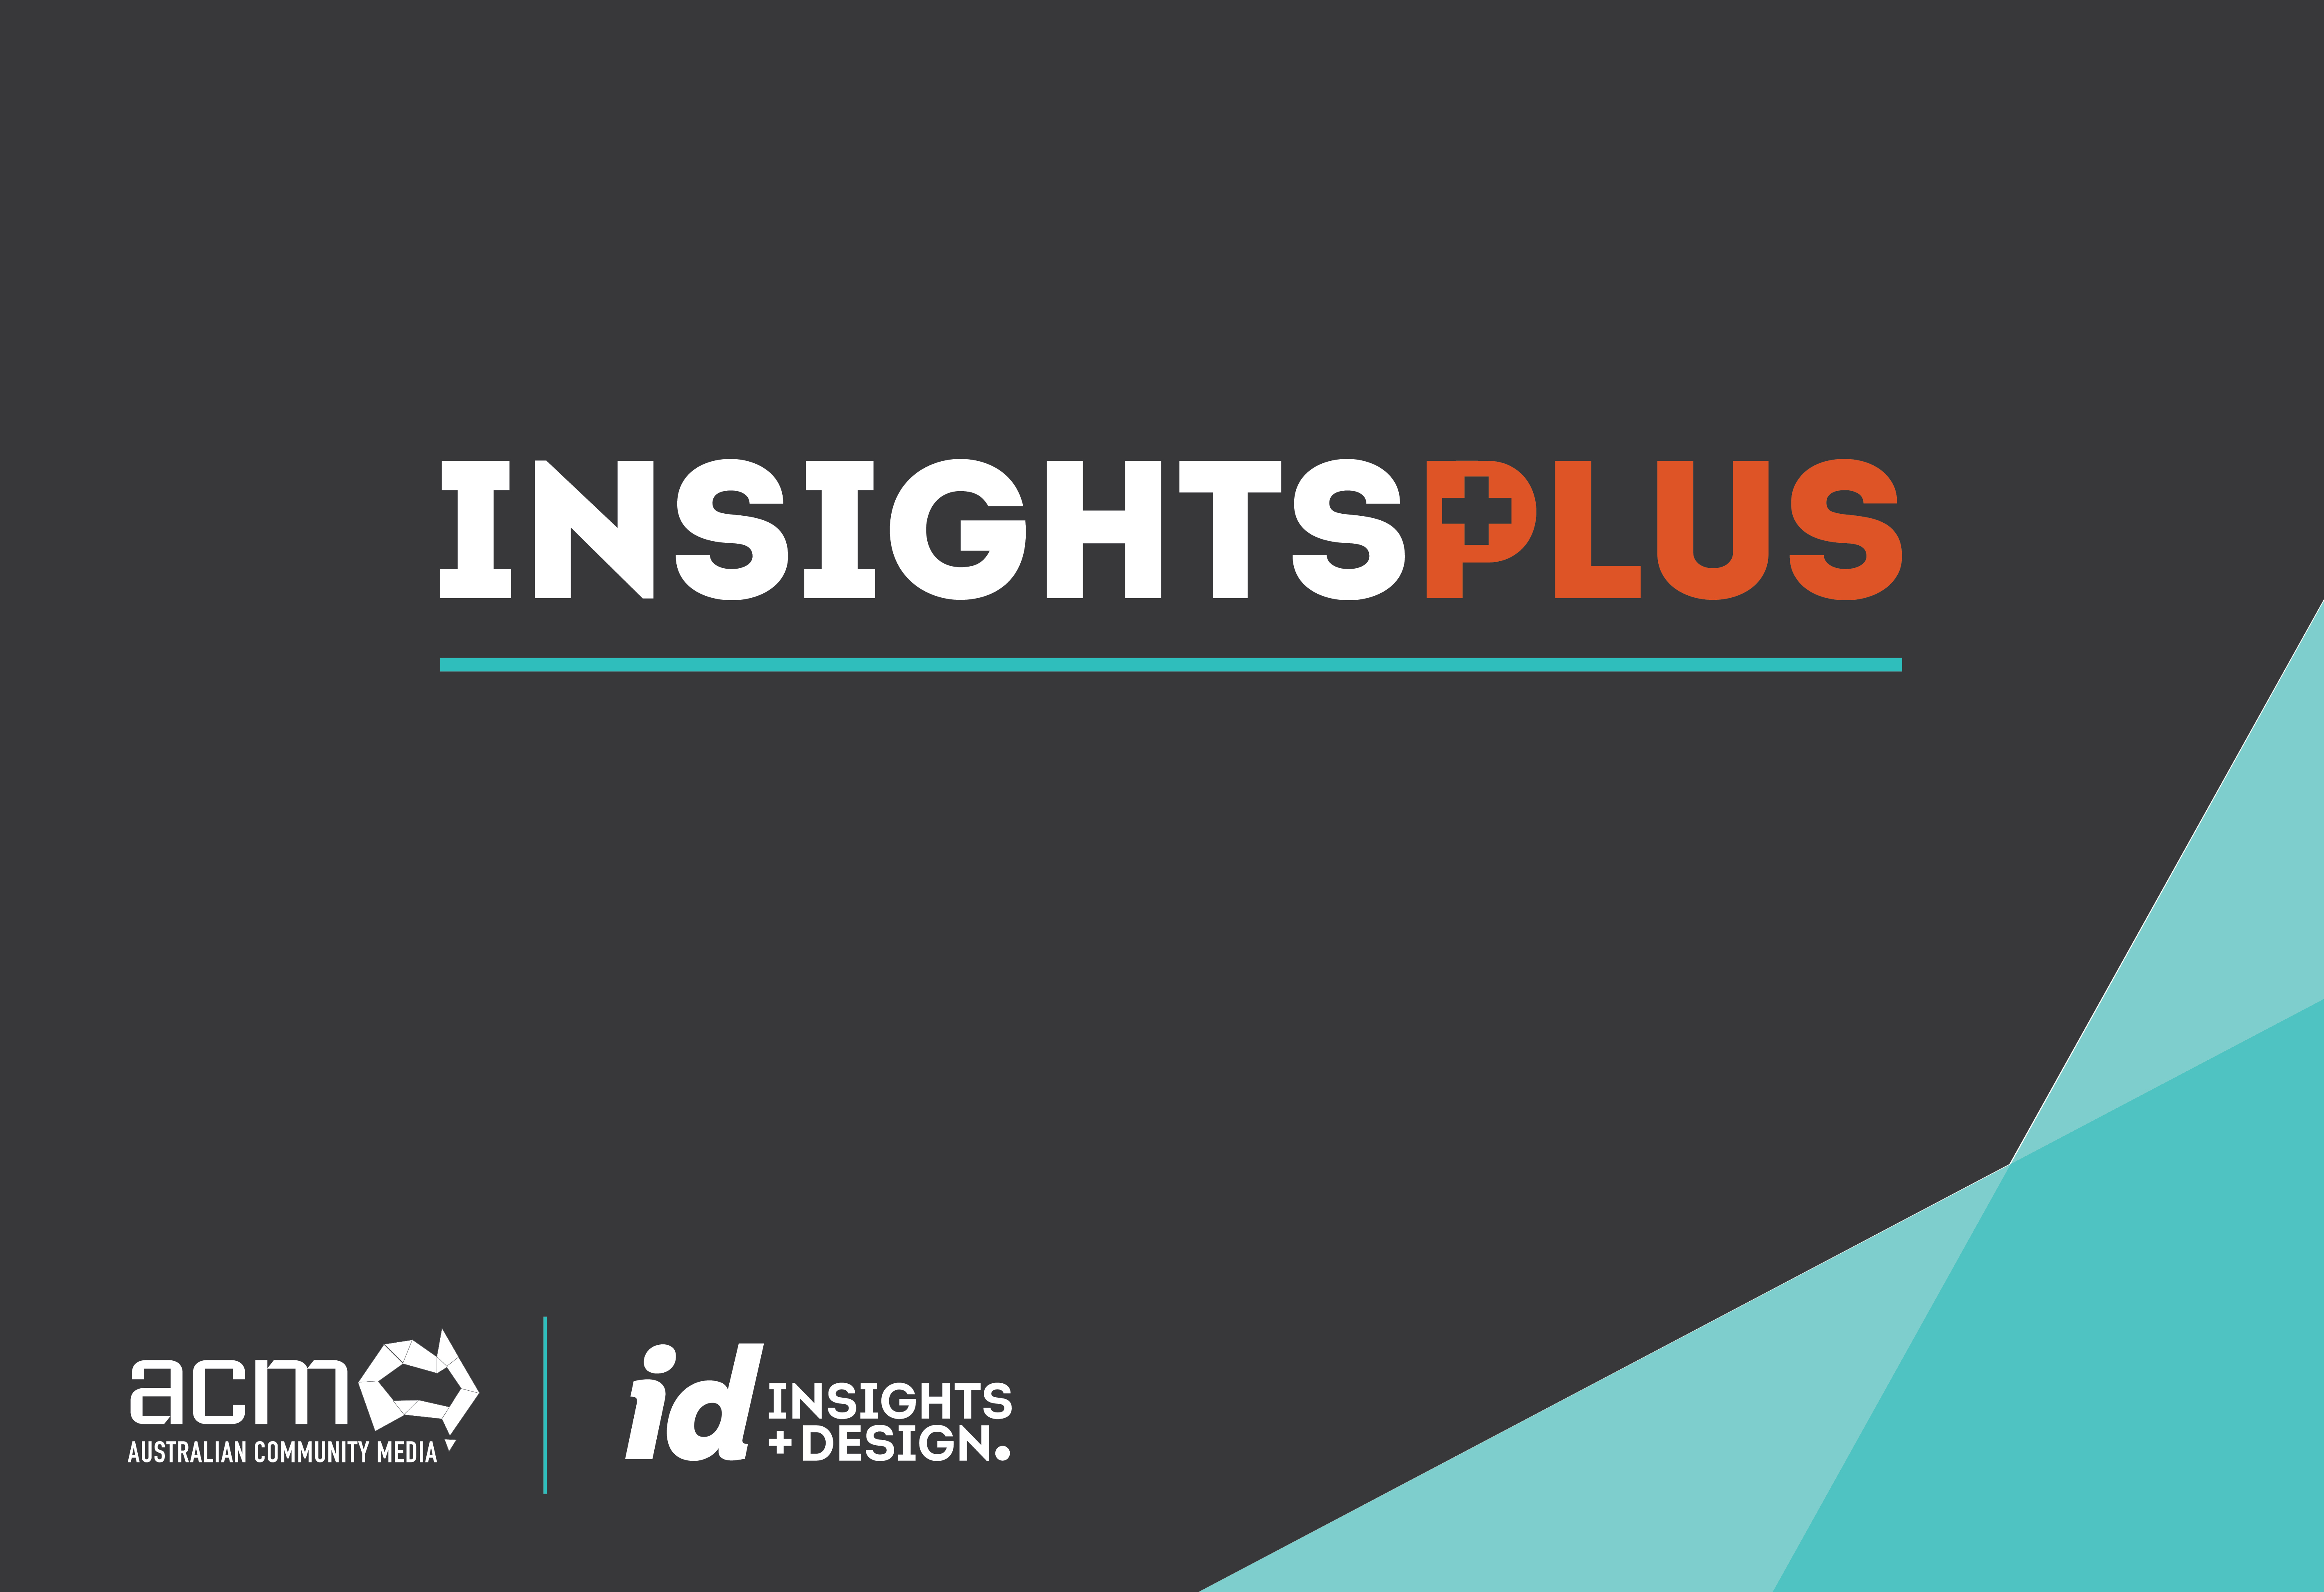 InsightsPlus